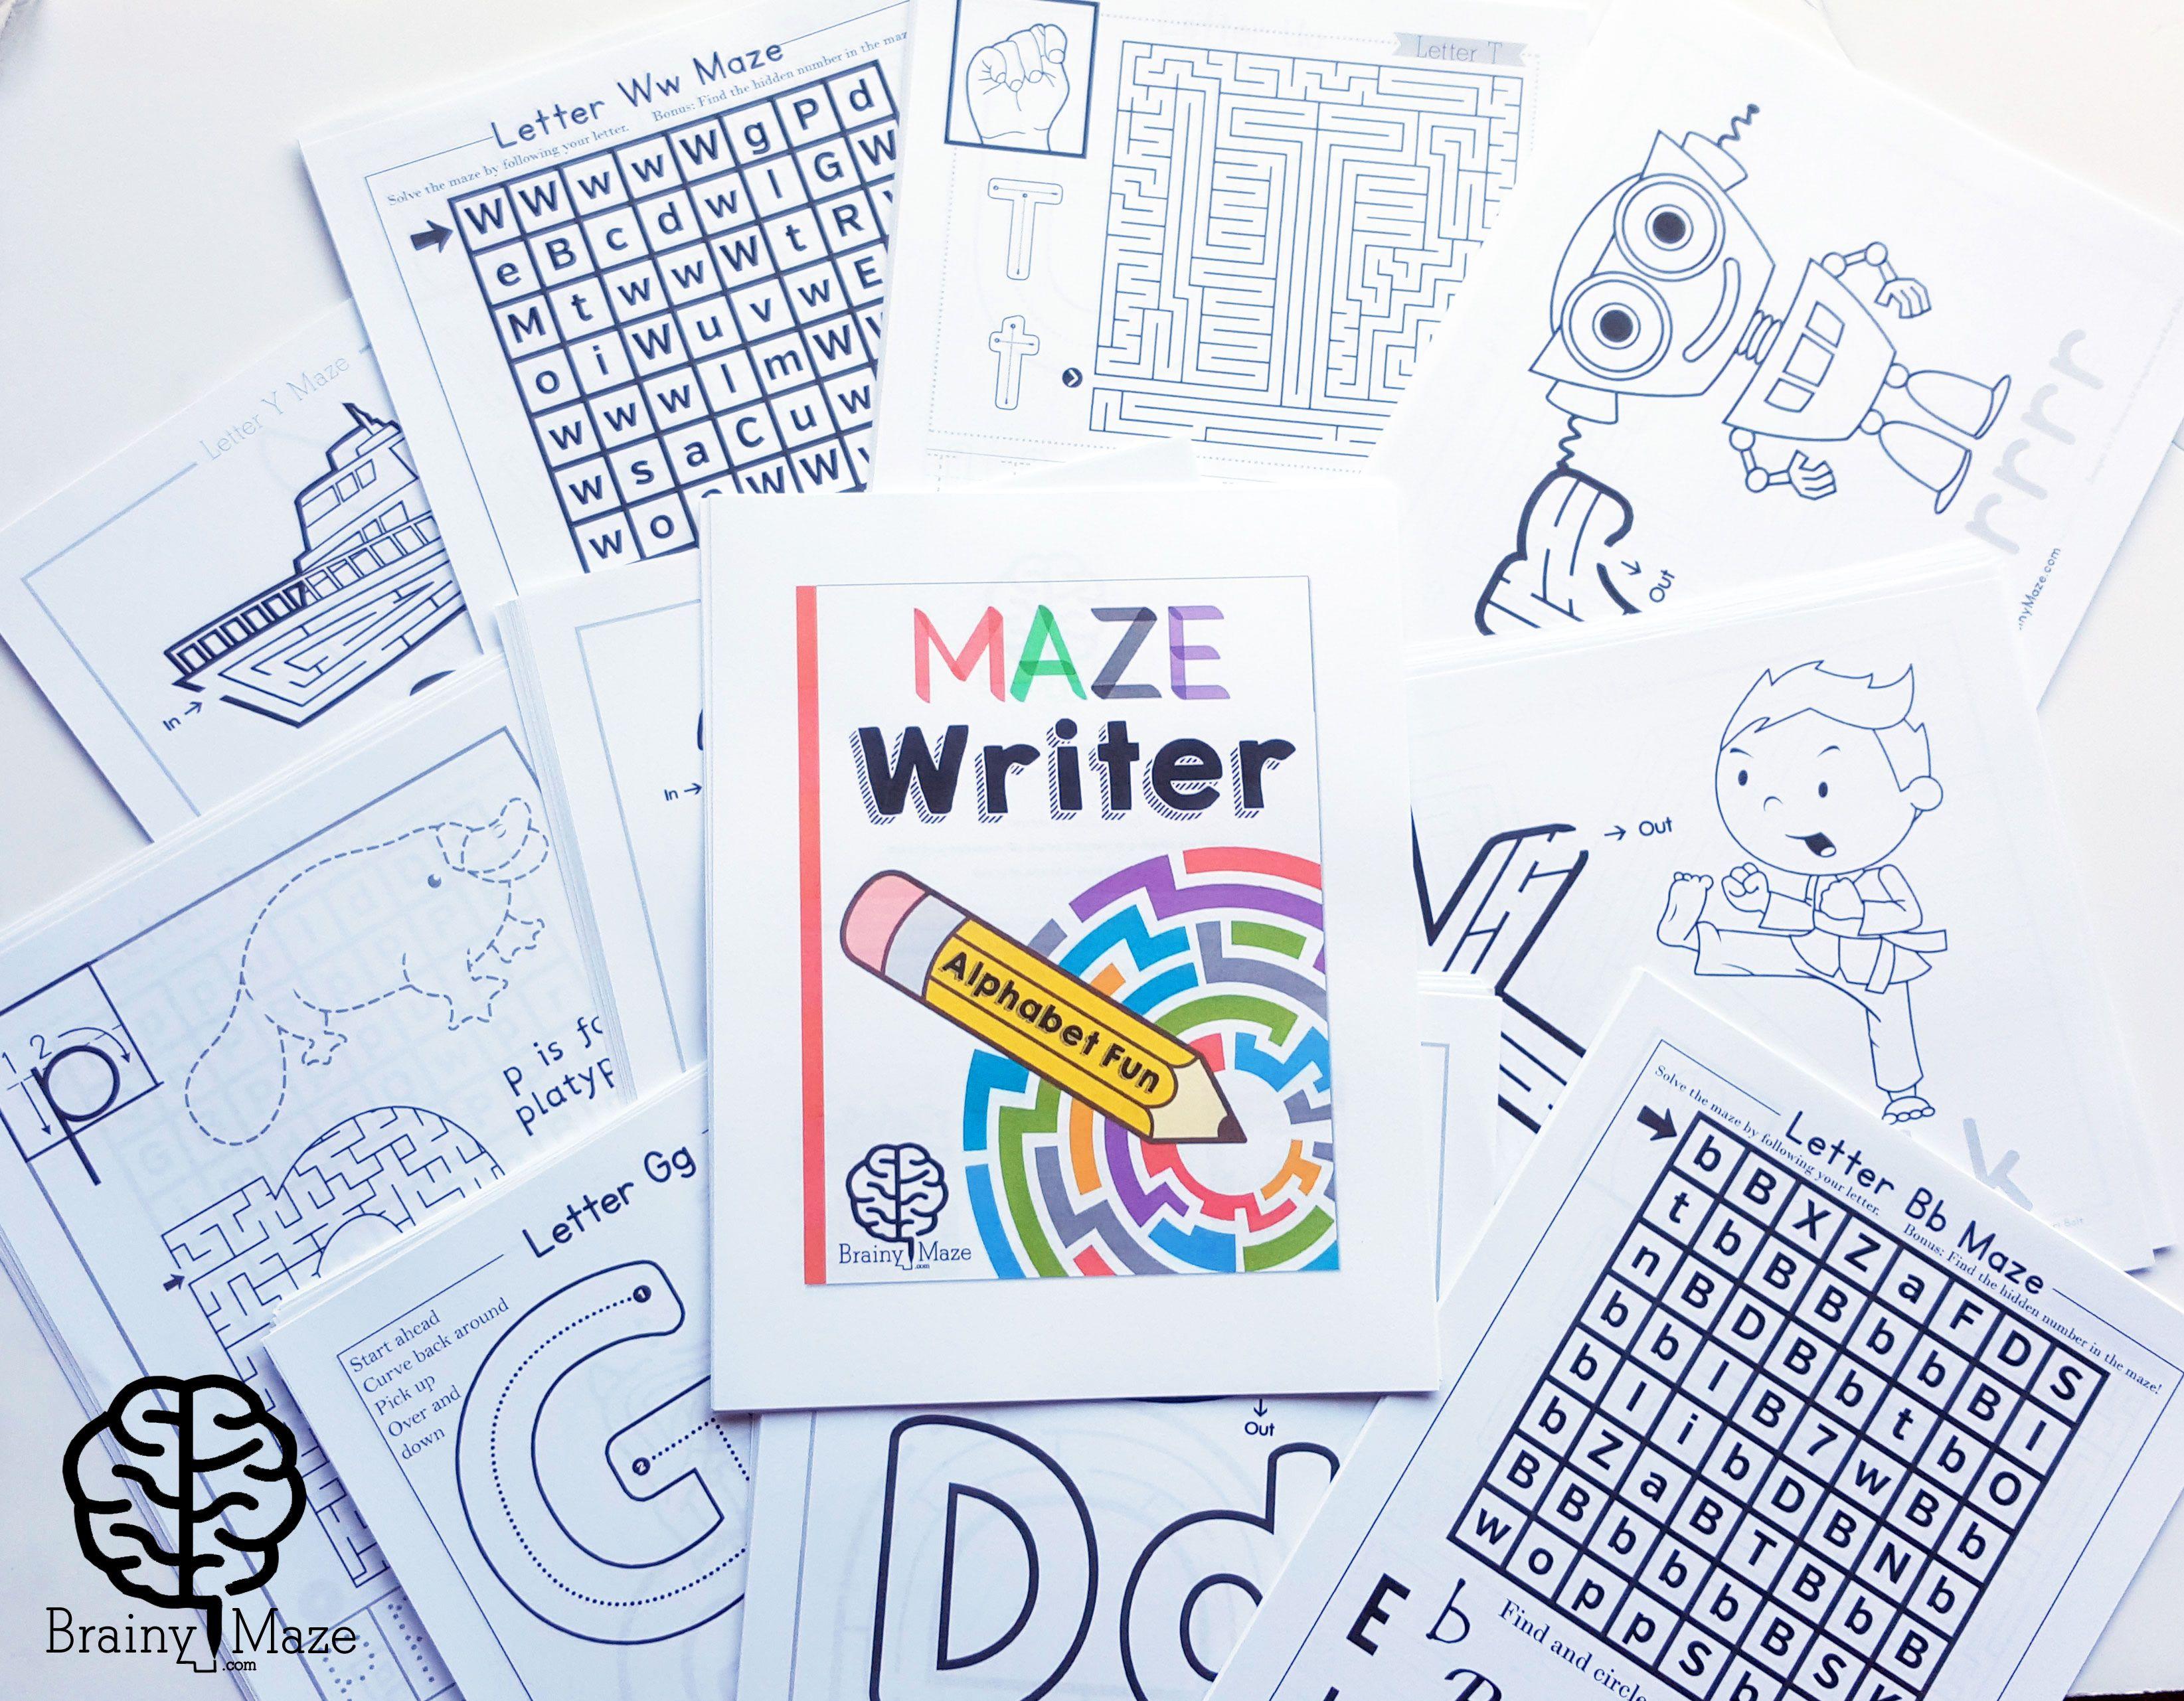 maze writer mazes for kids handwriting practice. Black Bedroom Furniture Sets. Home Design Ideas